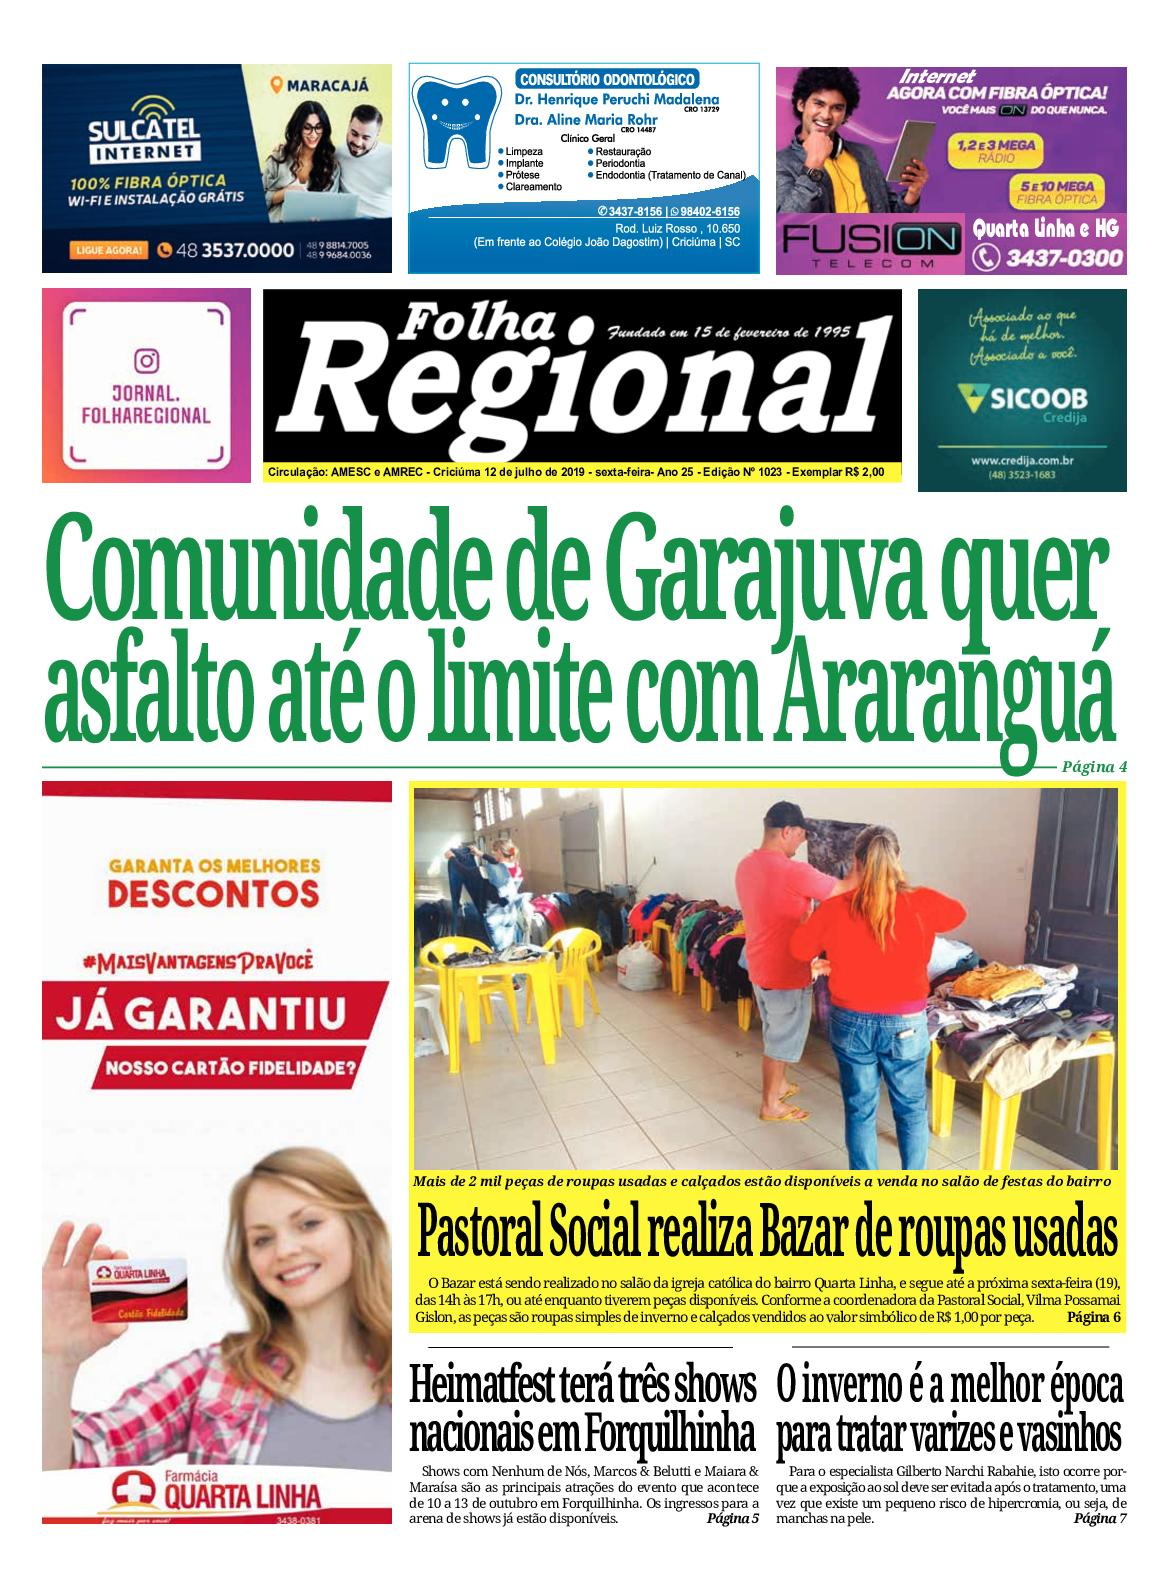 Folha Regional Ed.1023 - 12/07/2019